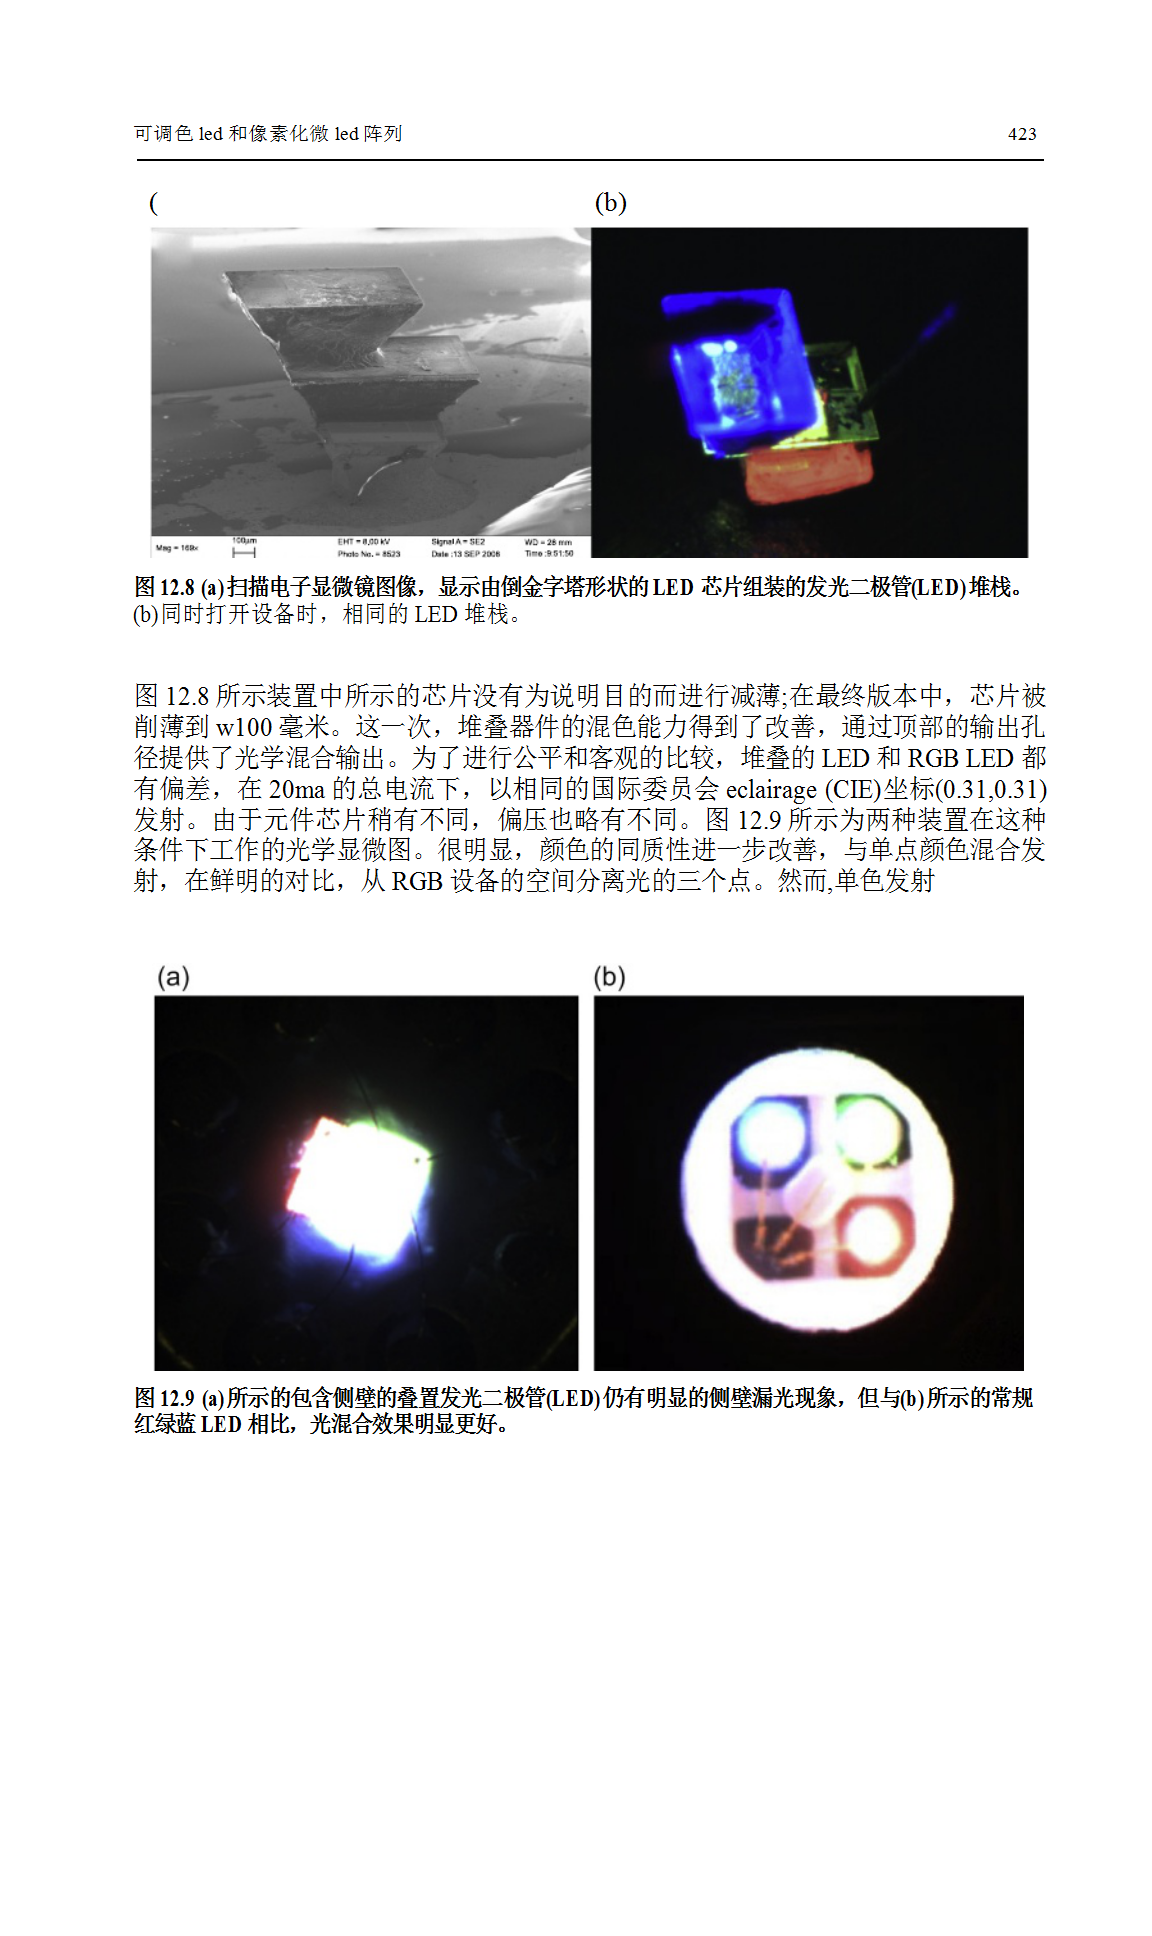 LED调色和像素化MicroLED阵列研究  第9张